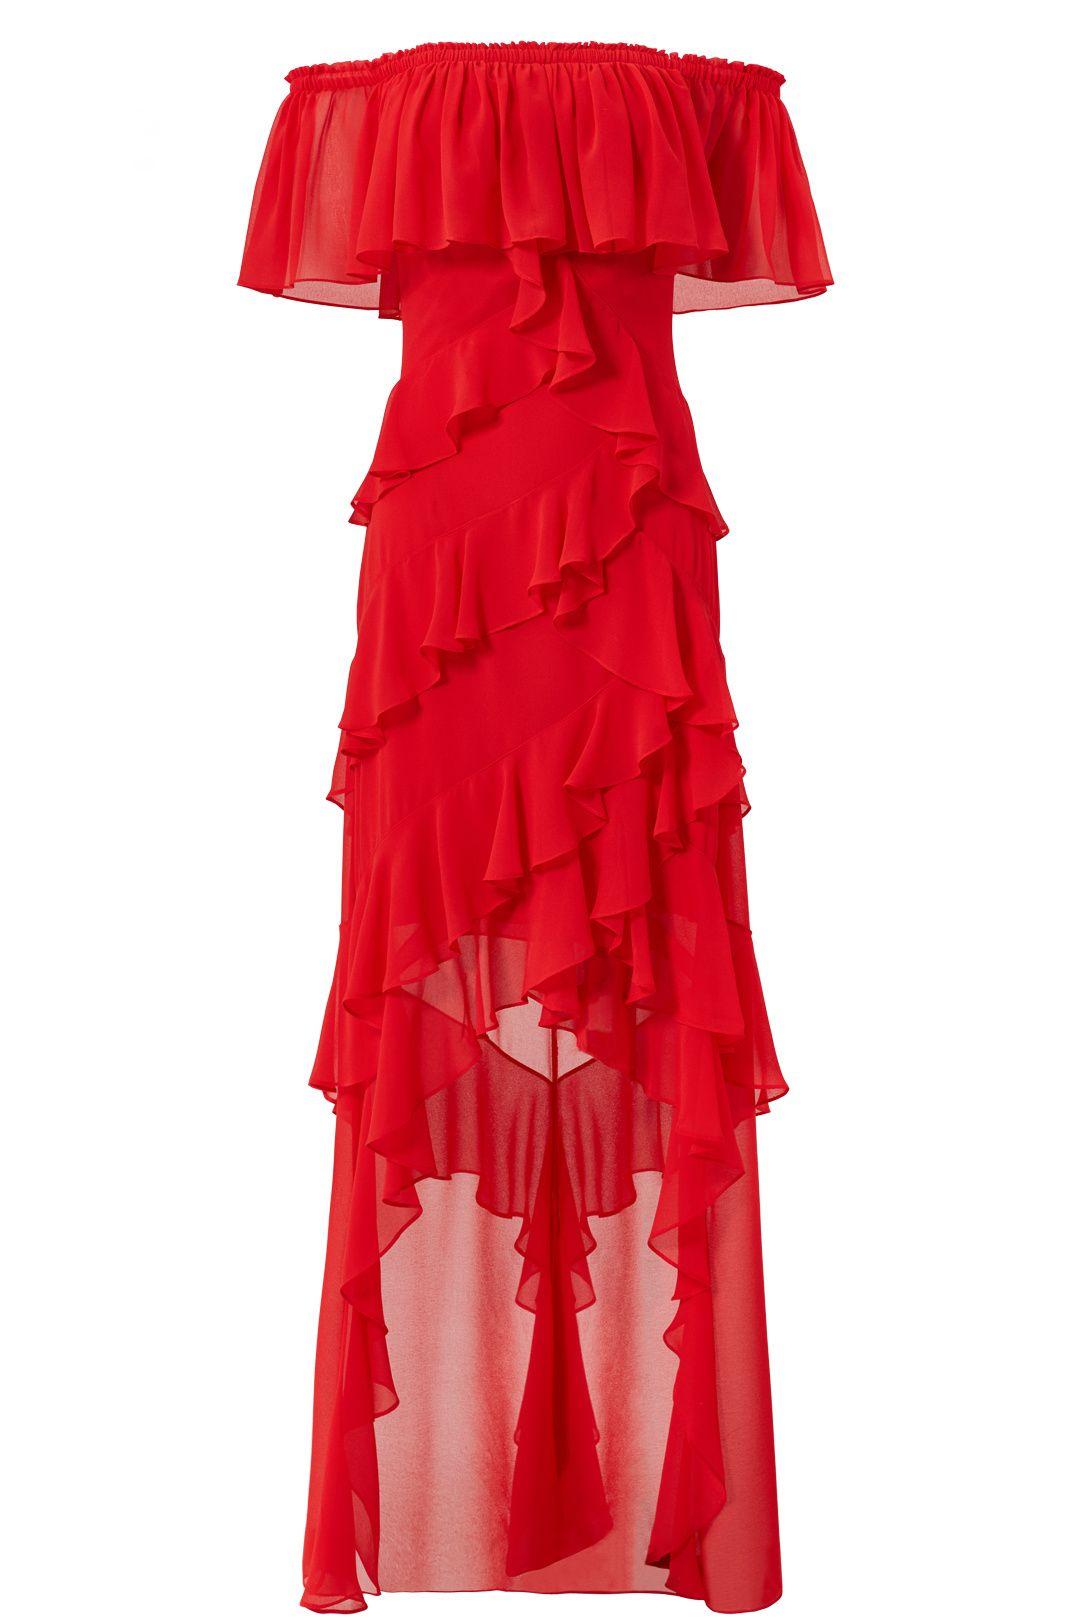 4d906426ba75 Badgley Mischka Red Off Shoulder Ruffle Gown